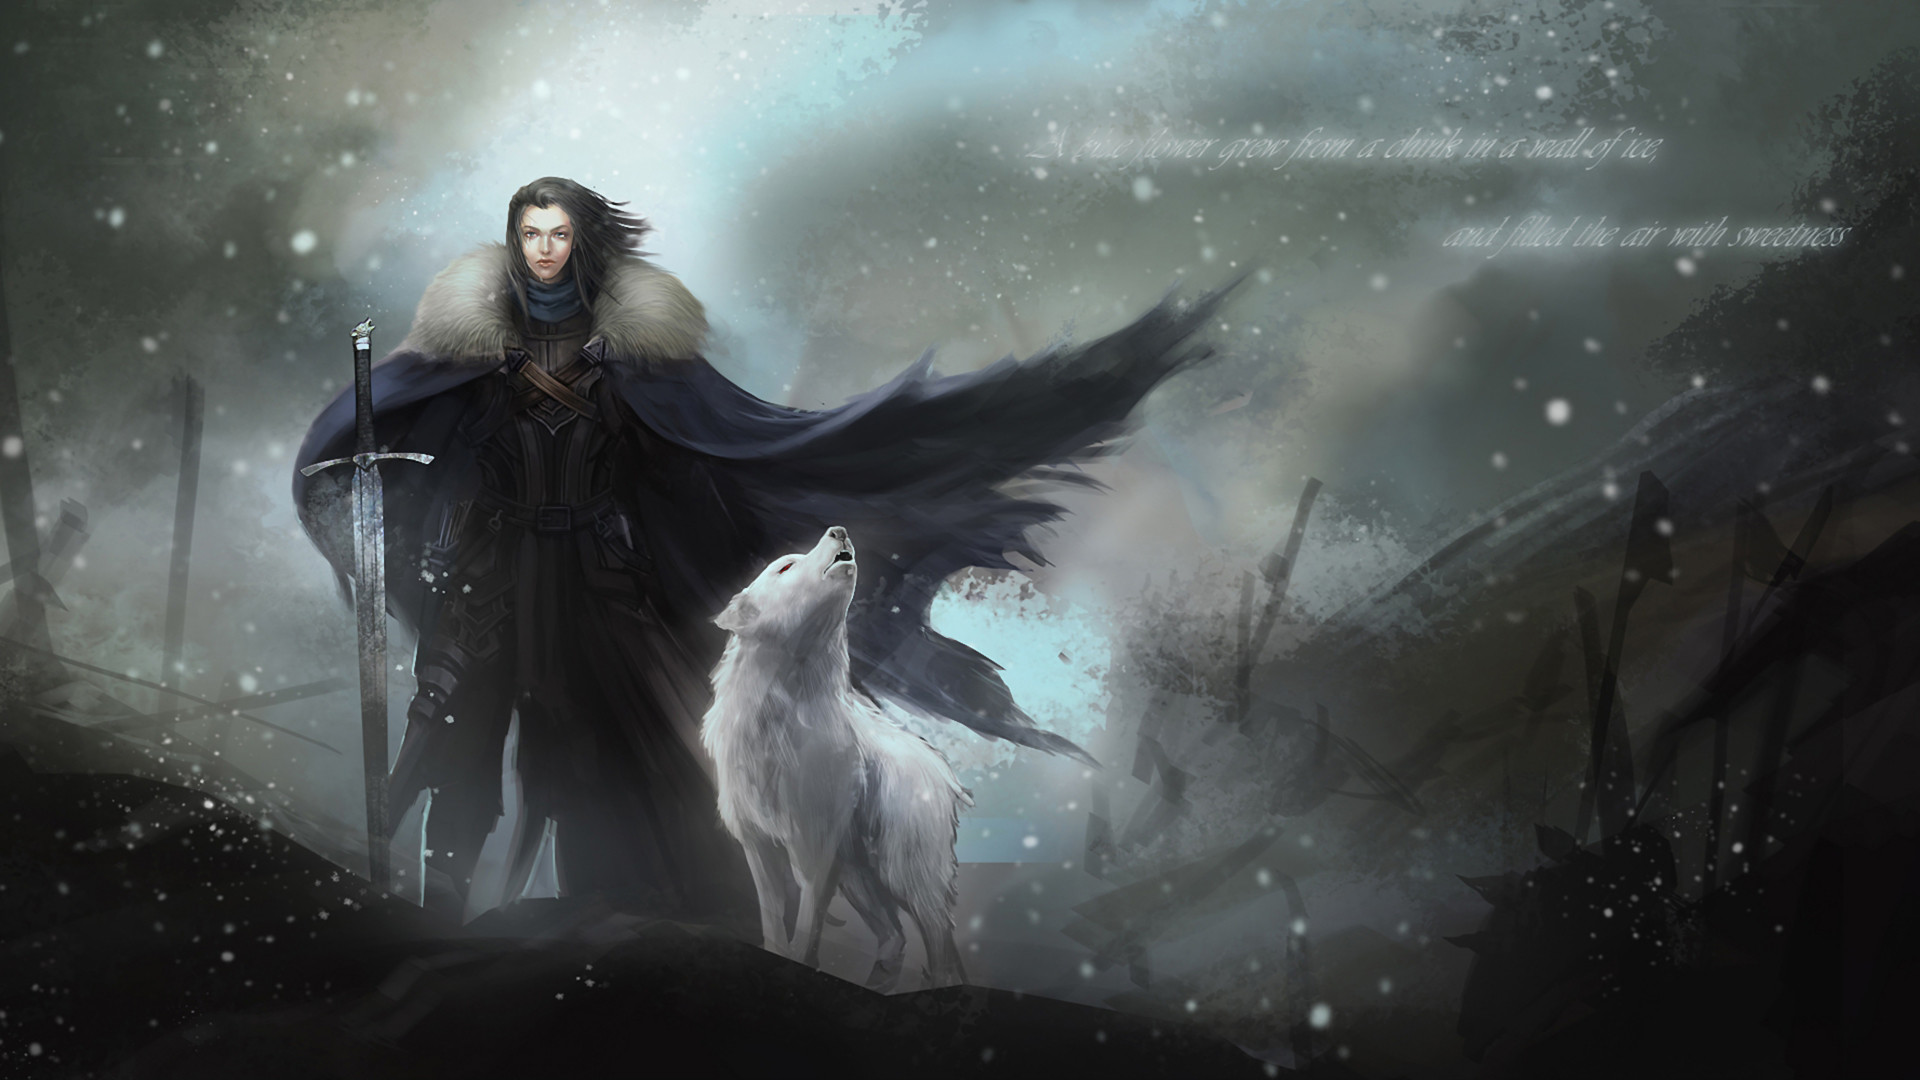 4k Game Of Thrones Wallpaper